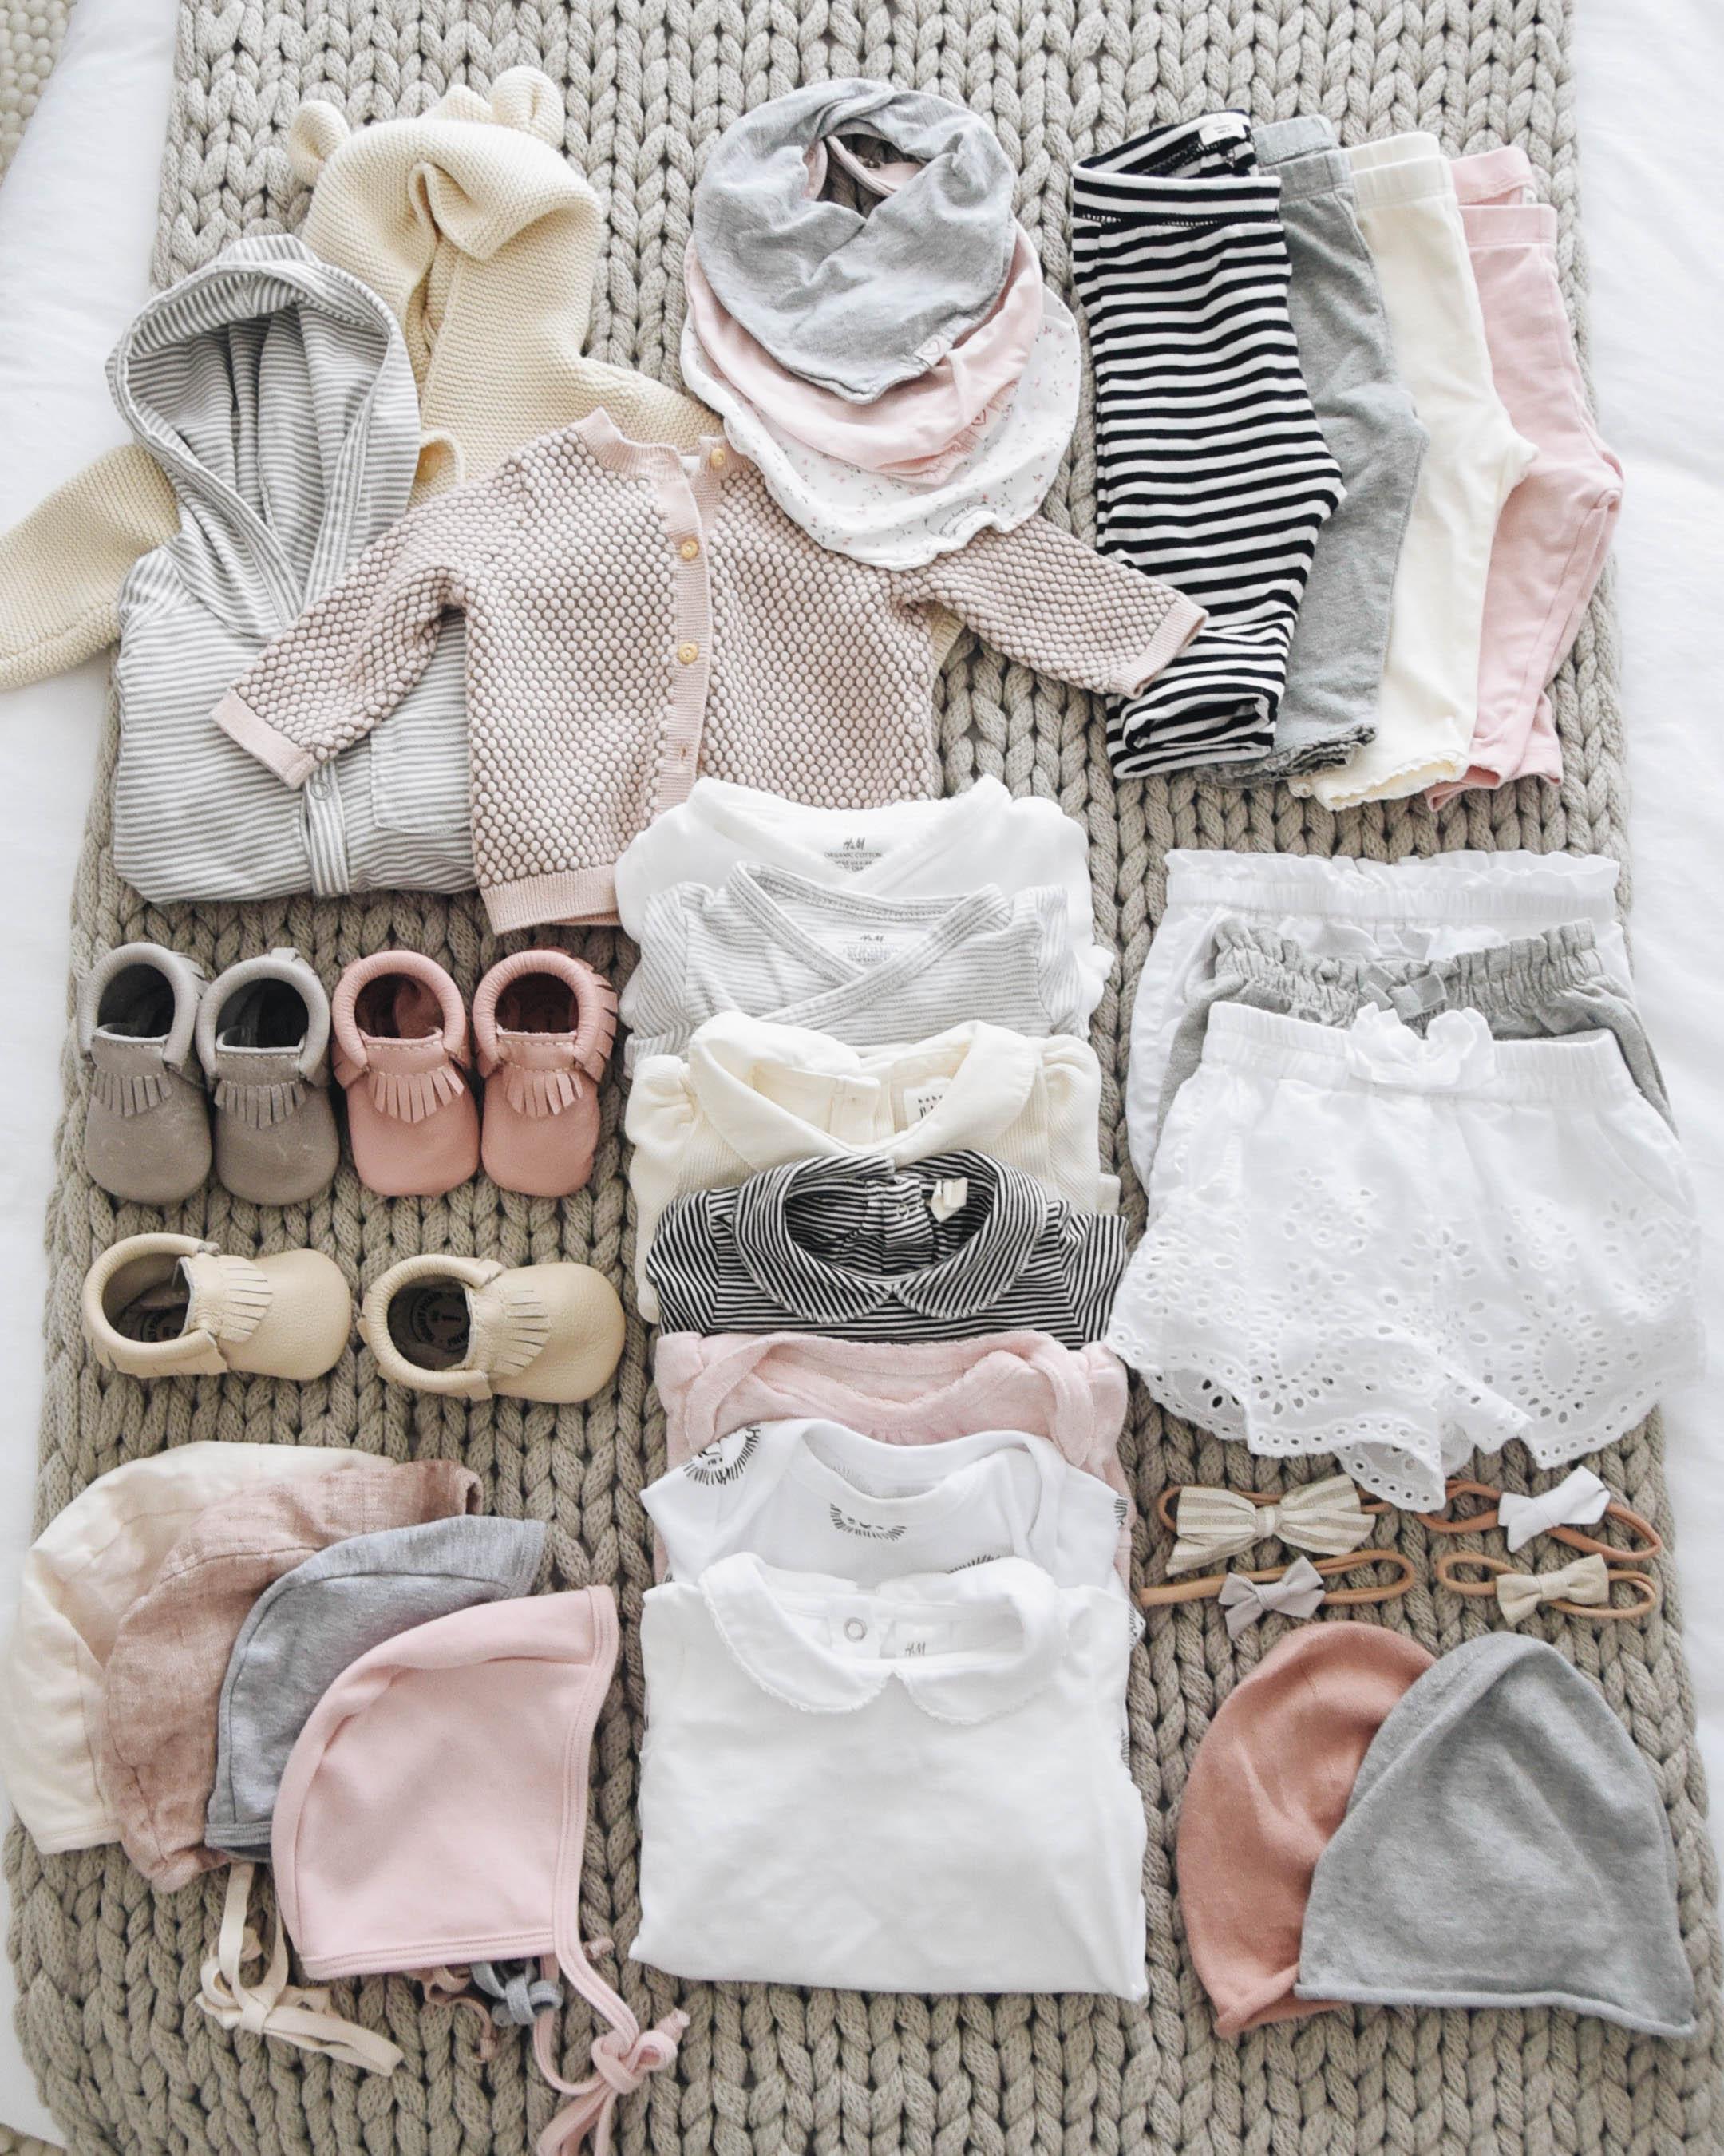 Baby capsule wardrobe